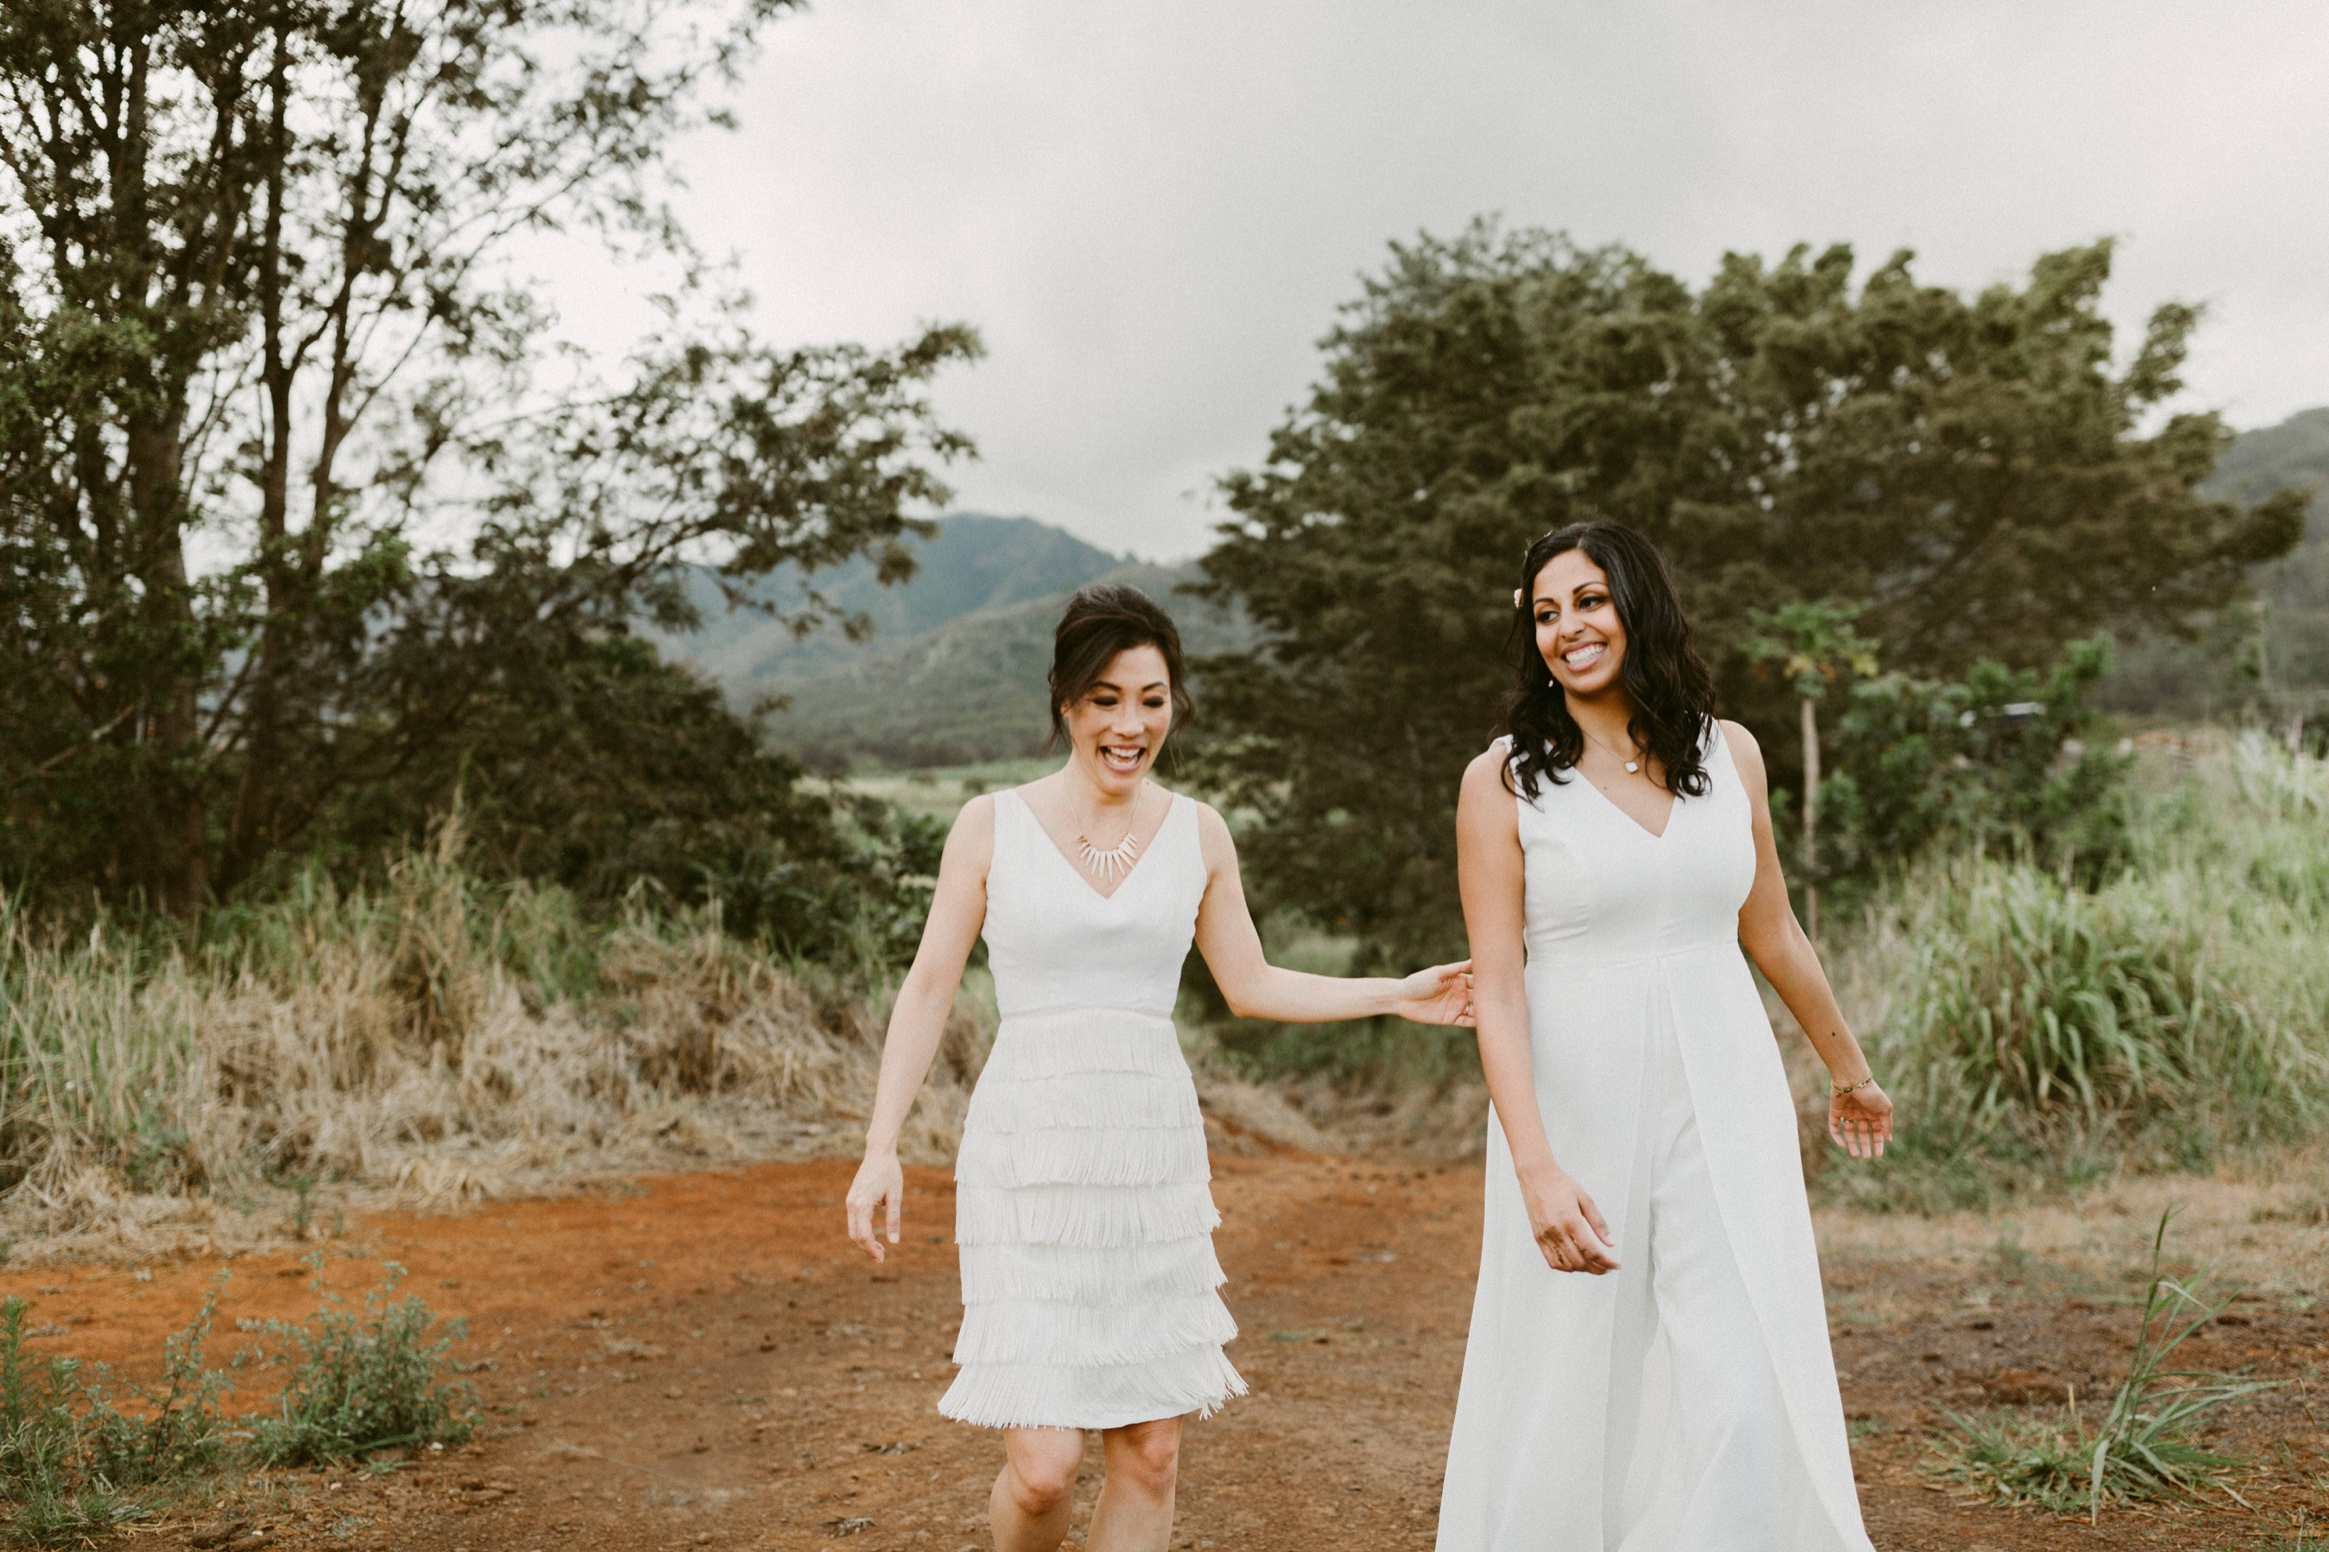 40_Oahu Hawaii Wedding  (160 of 294)_Oahu_sex_Hawaii_same_wedding_elopement_photographer.jpg